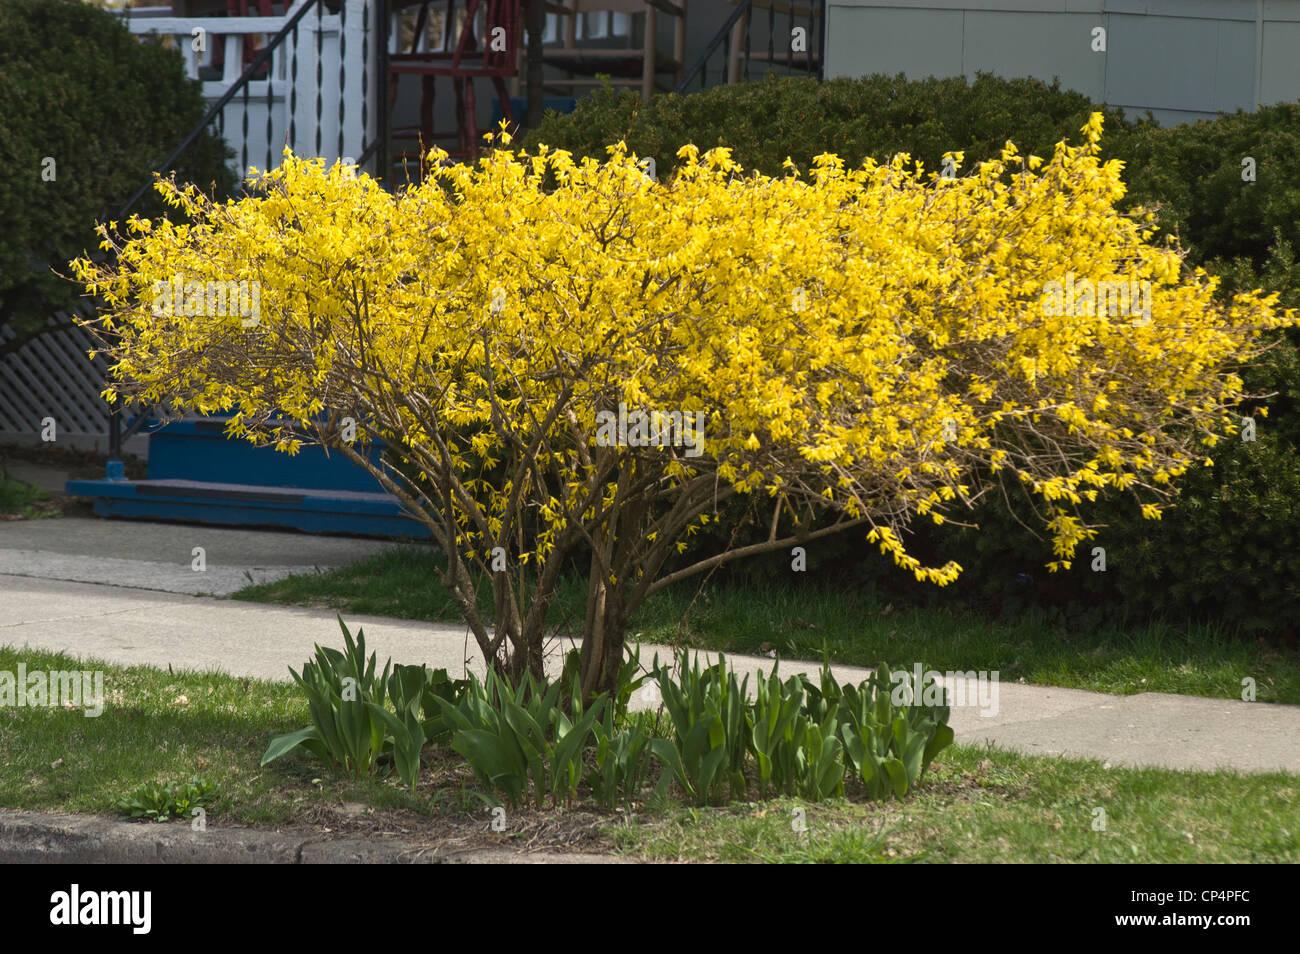 Fiori Gialli Ornamentali.Fiori Gialli Di Forsitia Bush In Piena Fioritura Oleaceae